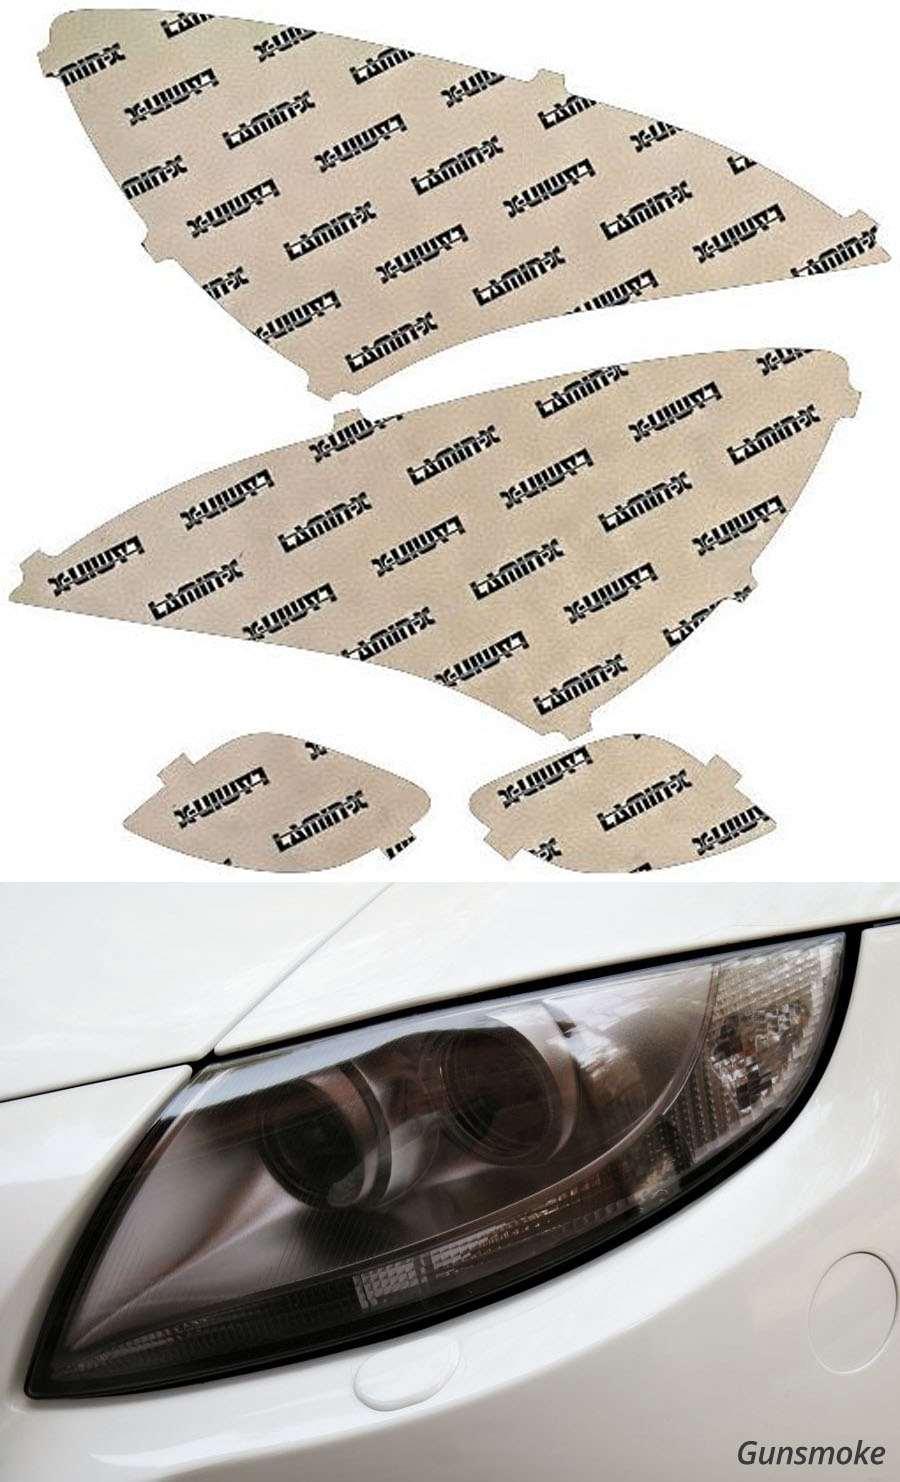 Hyundai Genesis Coupe 09-12 Gunsmoke Headlight Covers Lamin-X HY011G